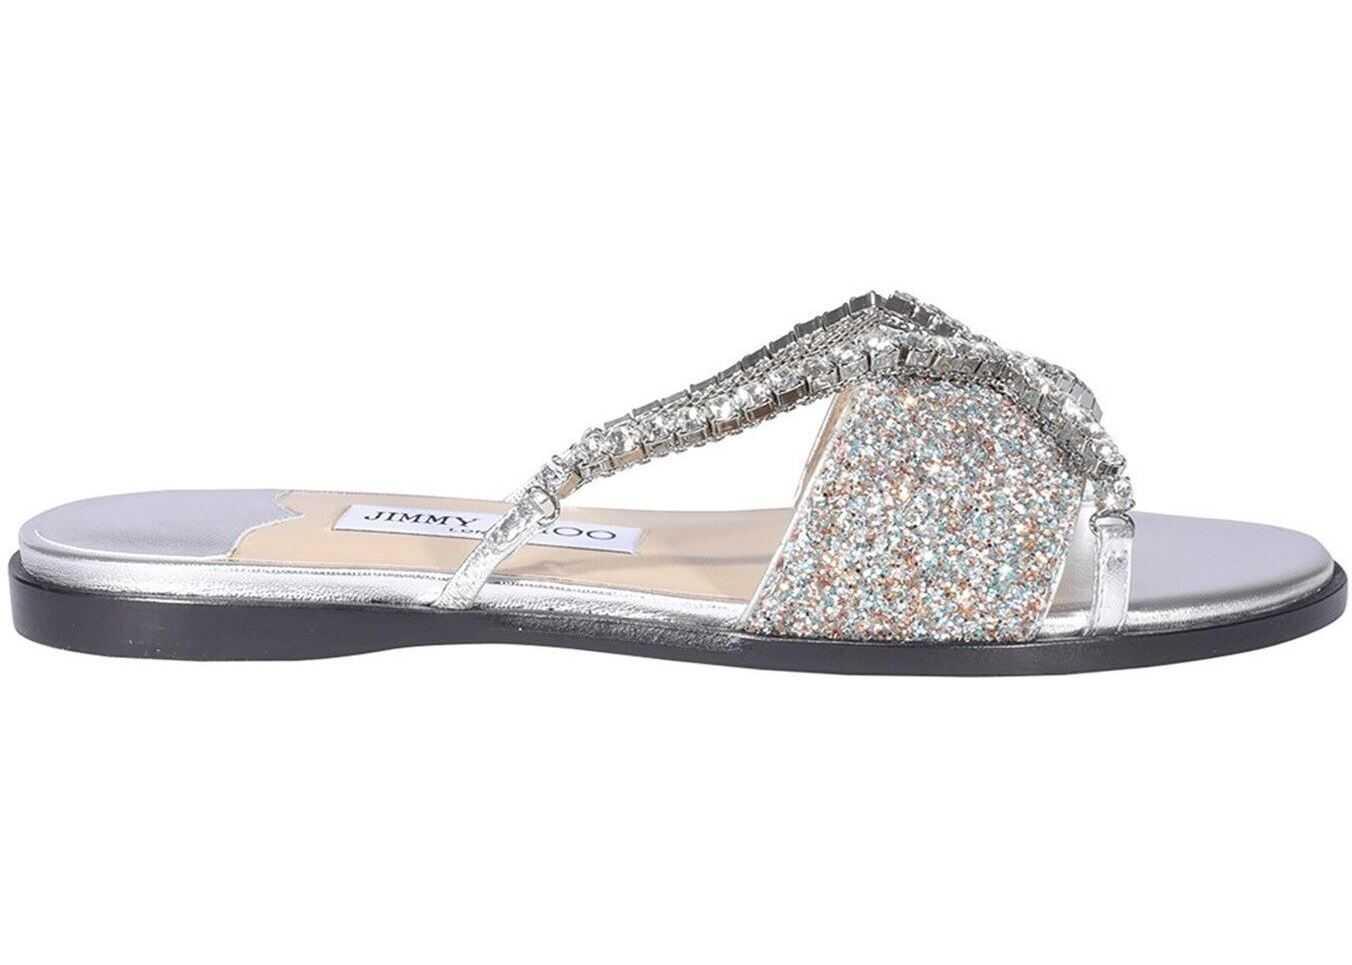 Jimmy Choo Aadi Sandals In Silver Color AADIFLATYOGSILVERMULTICRYSTAL Silver imagine b-mall.ro